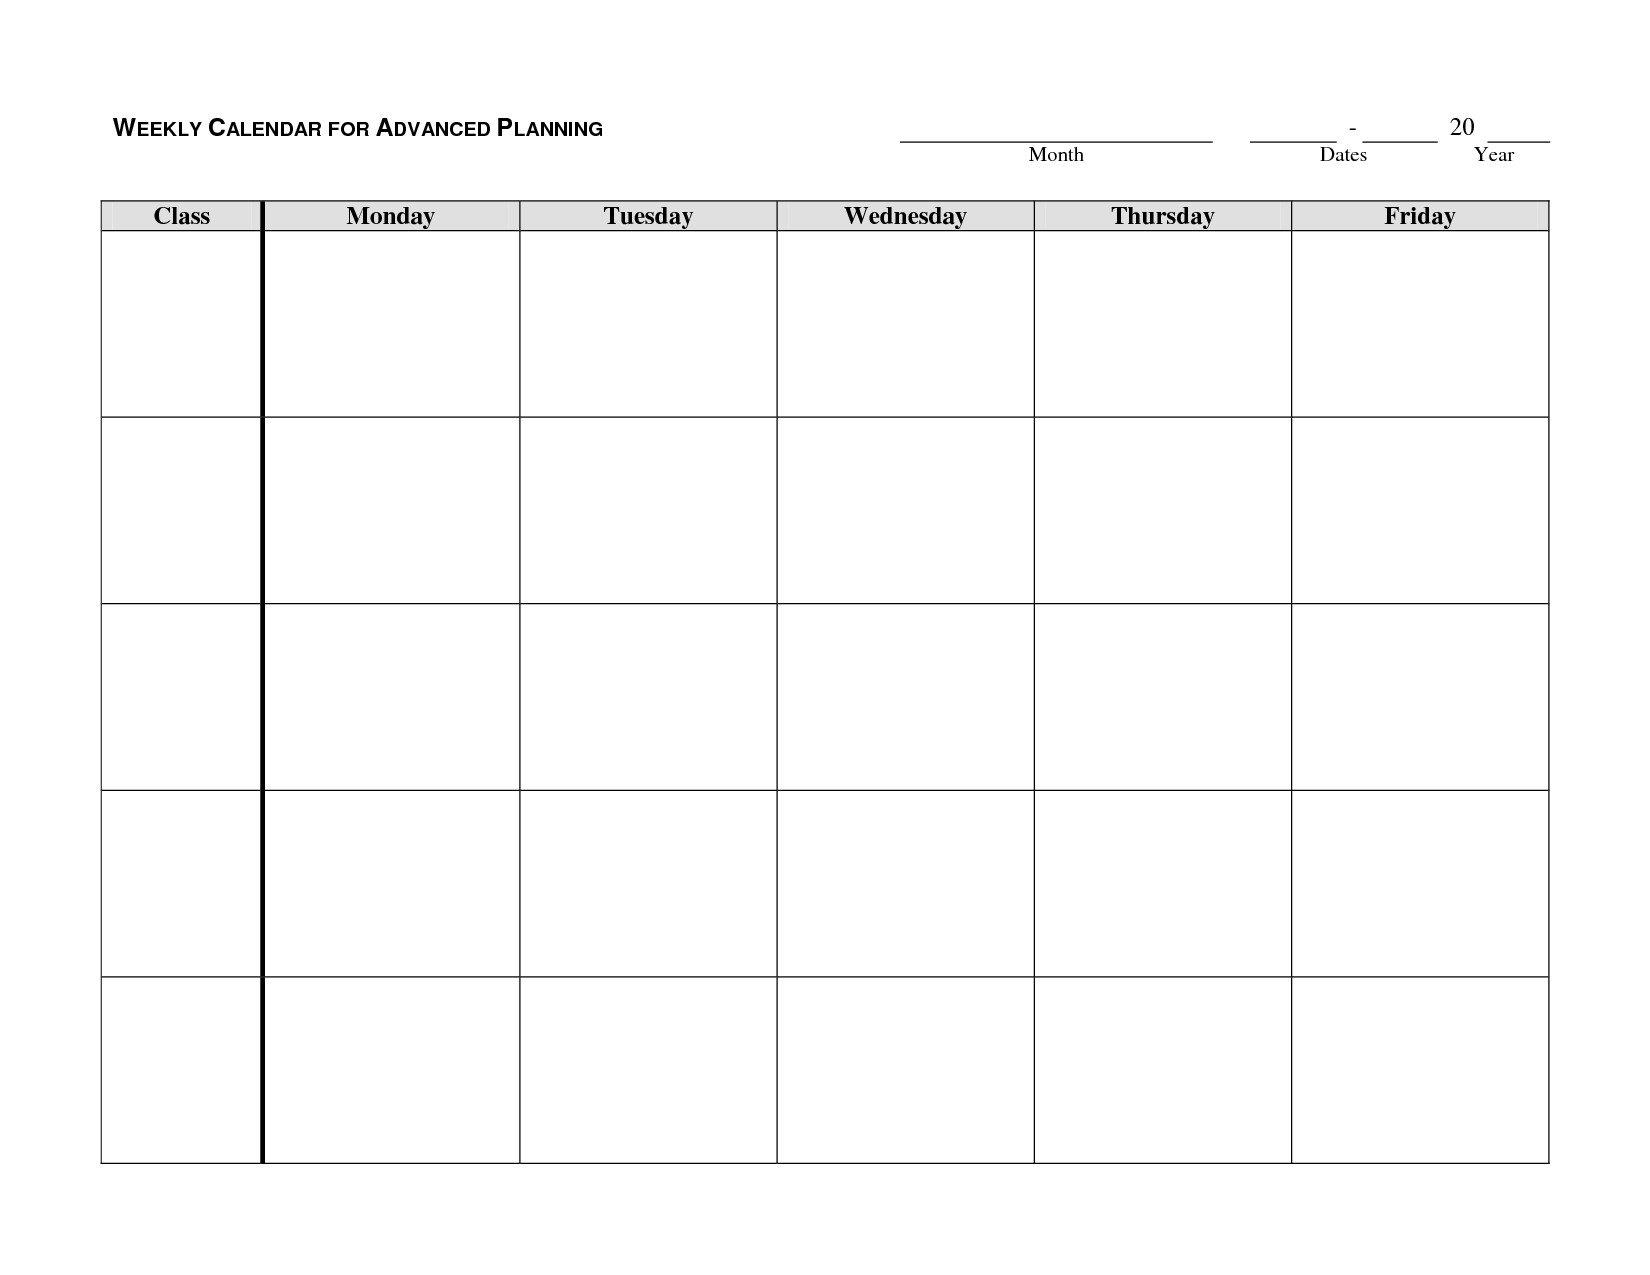 Week Template Monday Through Friday – Calendar Inspiration Mon Thru Fri Weekly Planner Printable